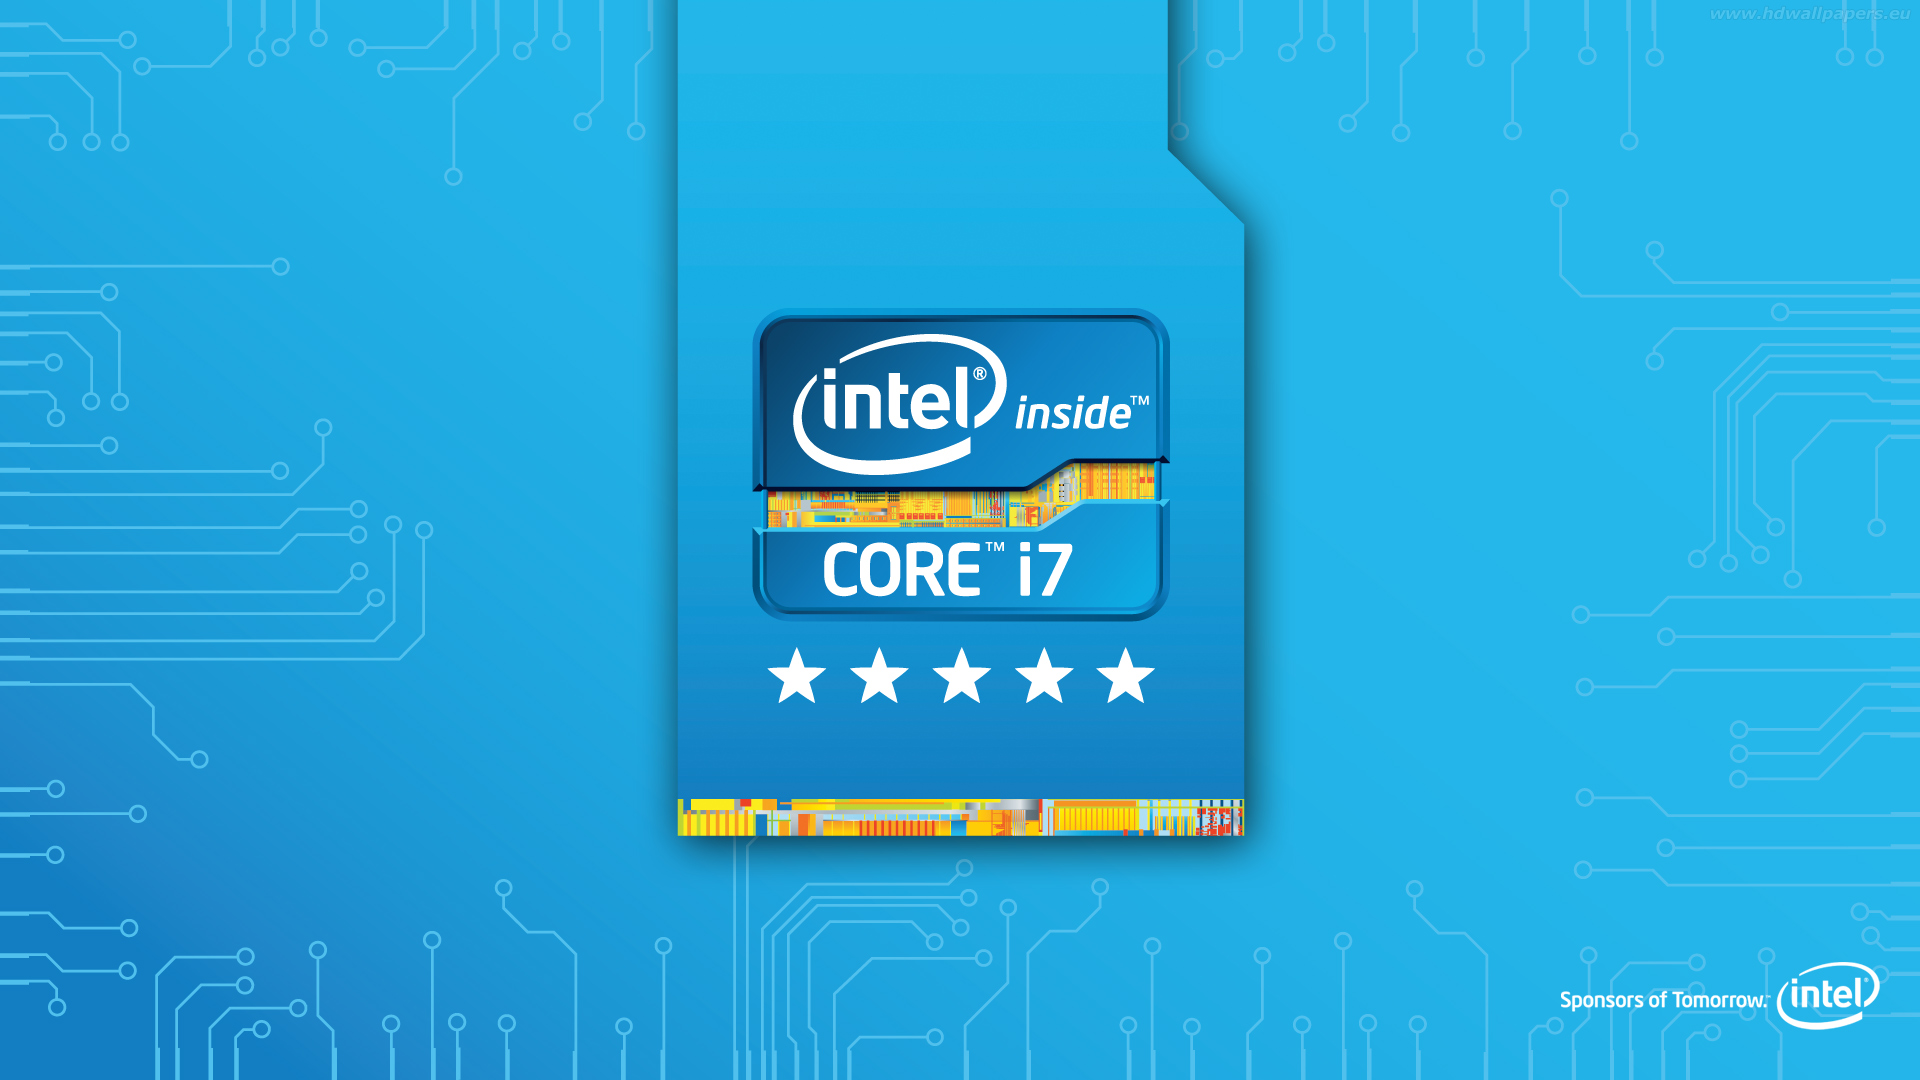 Wallpaper intel core i7 19201080 jpg 1920x1080